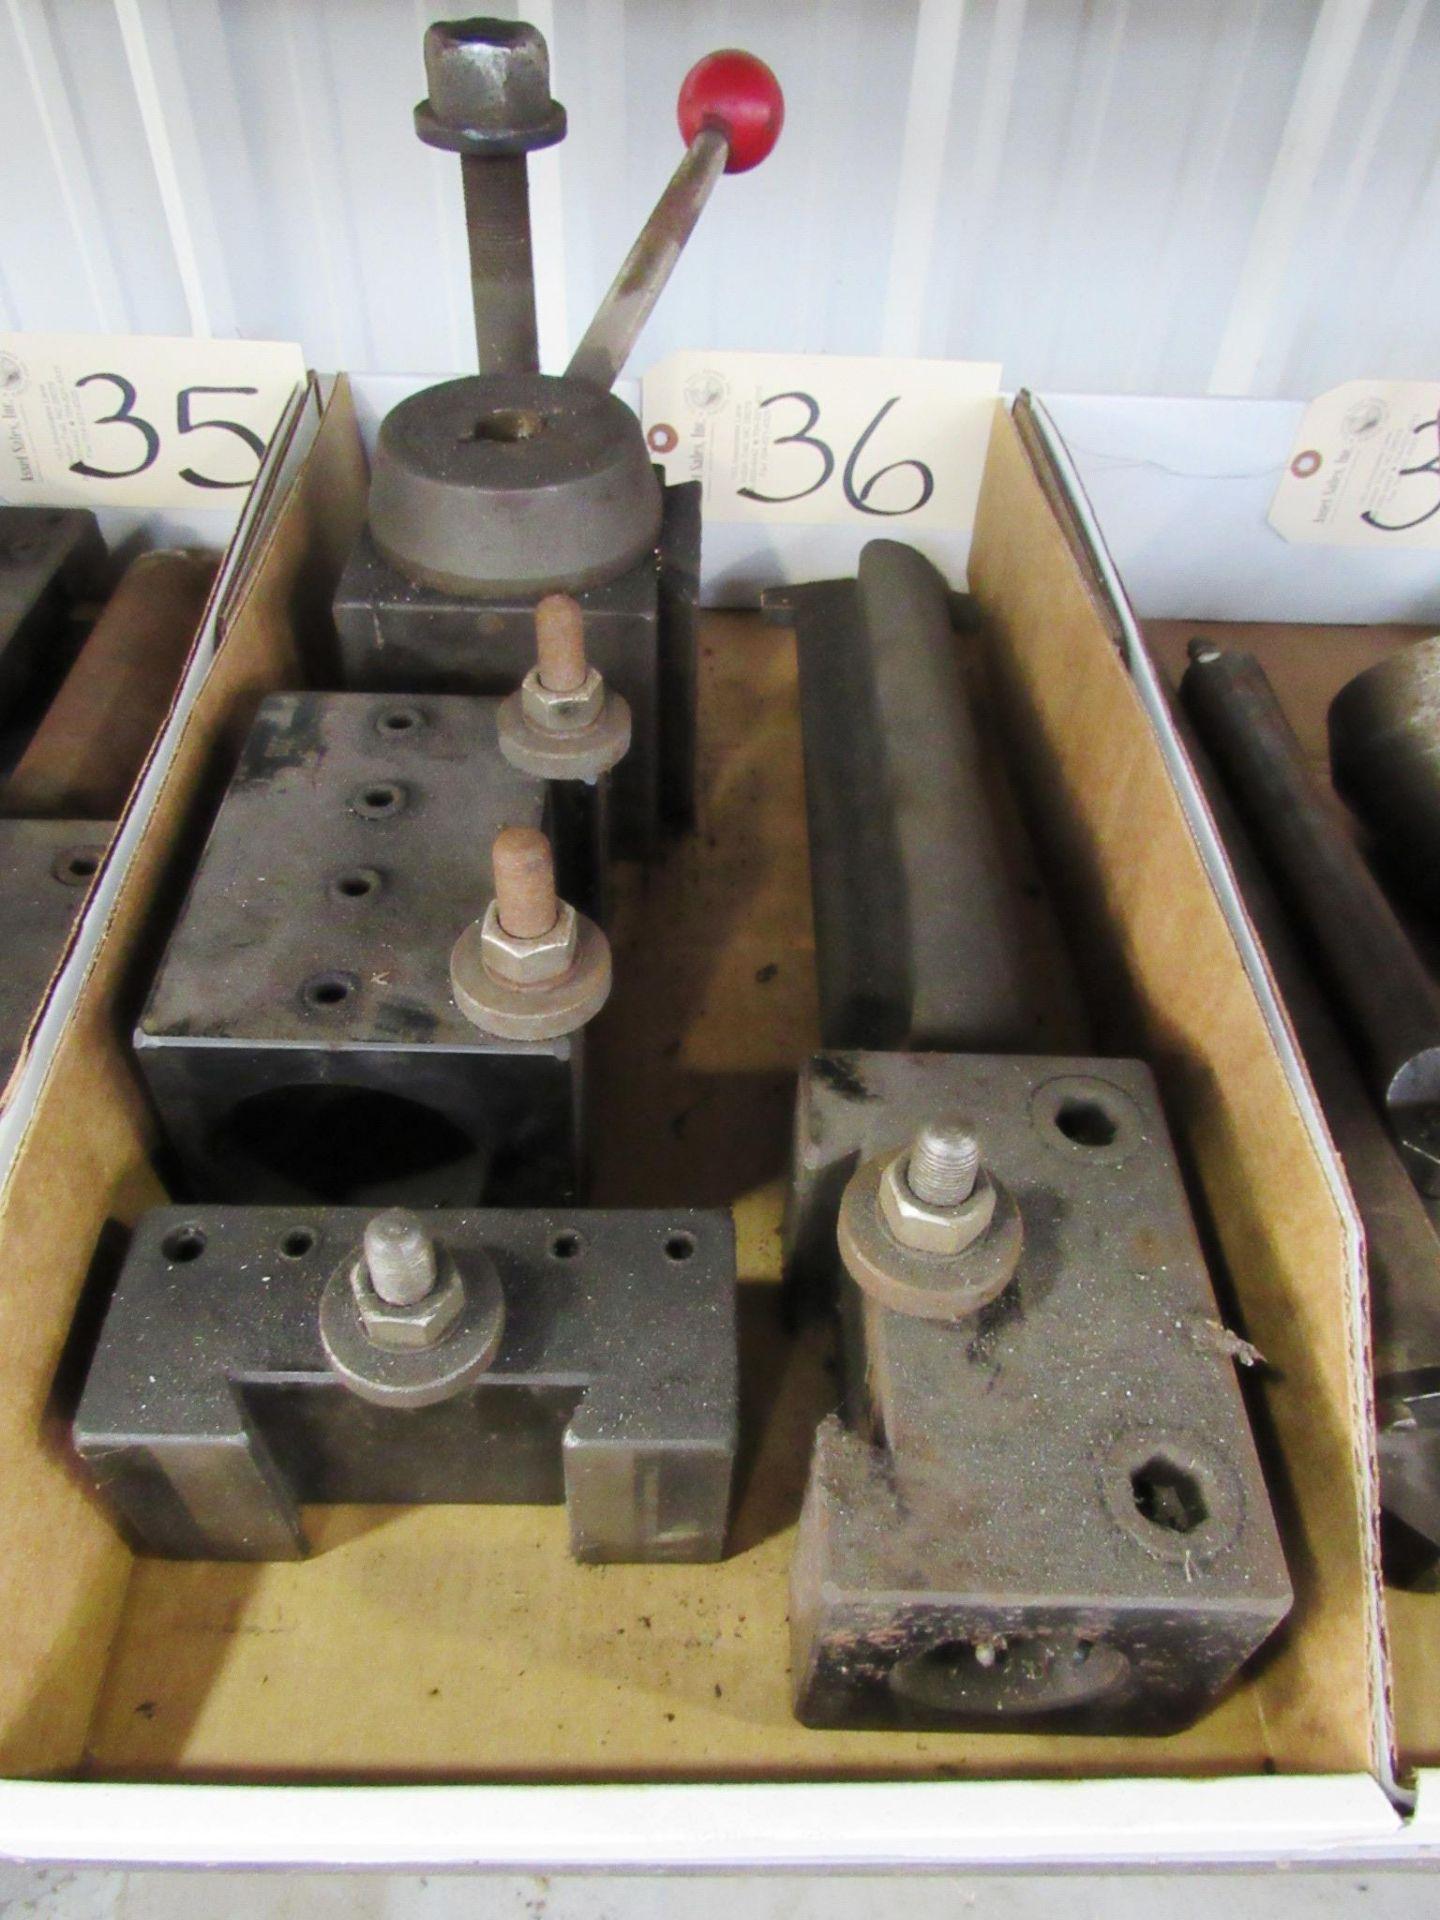 Lot 36 - Toolpost & Attachments (fits oil lathe)